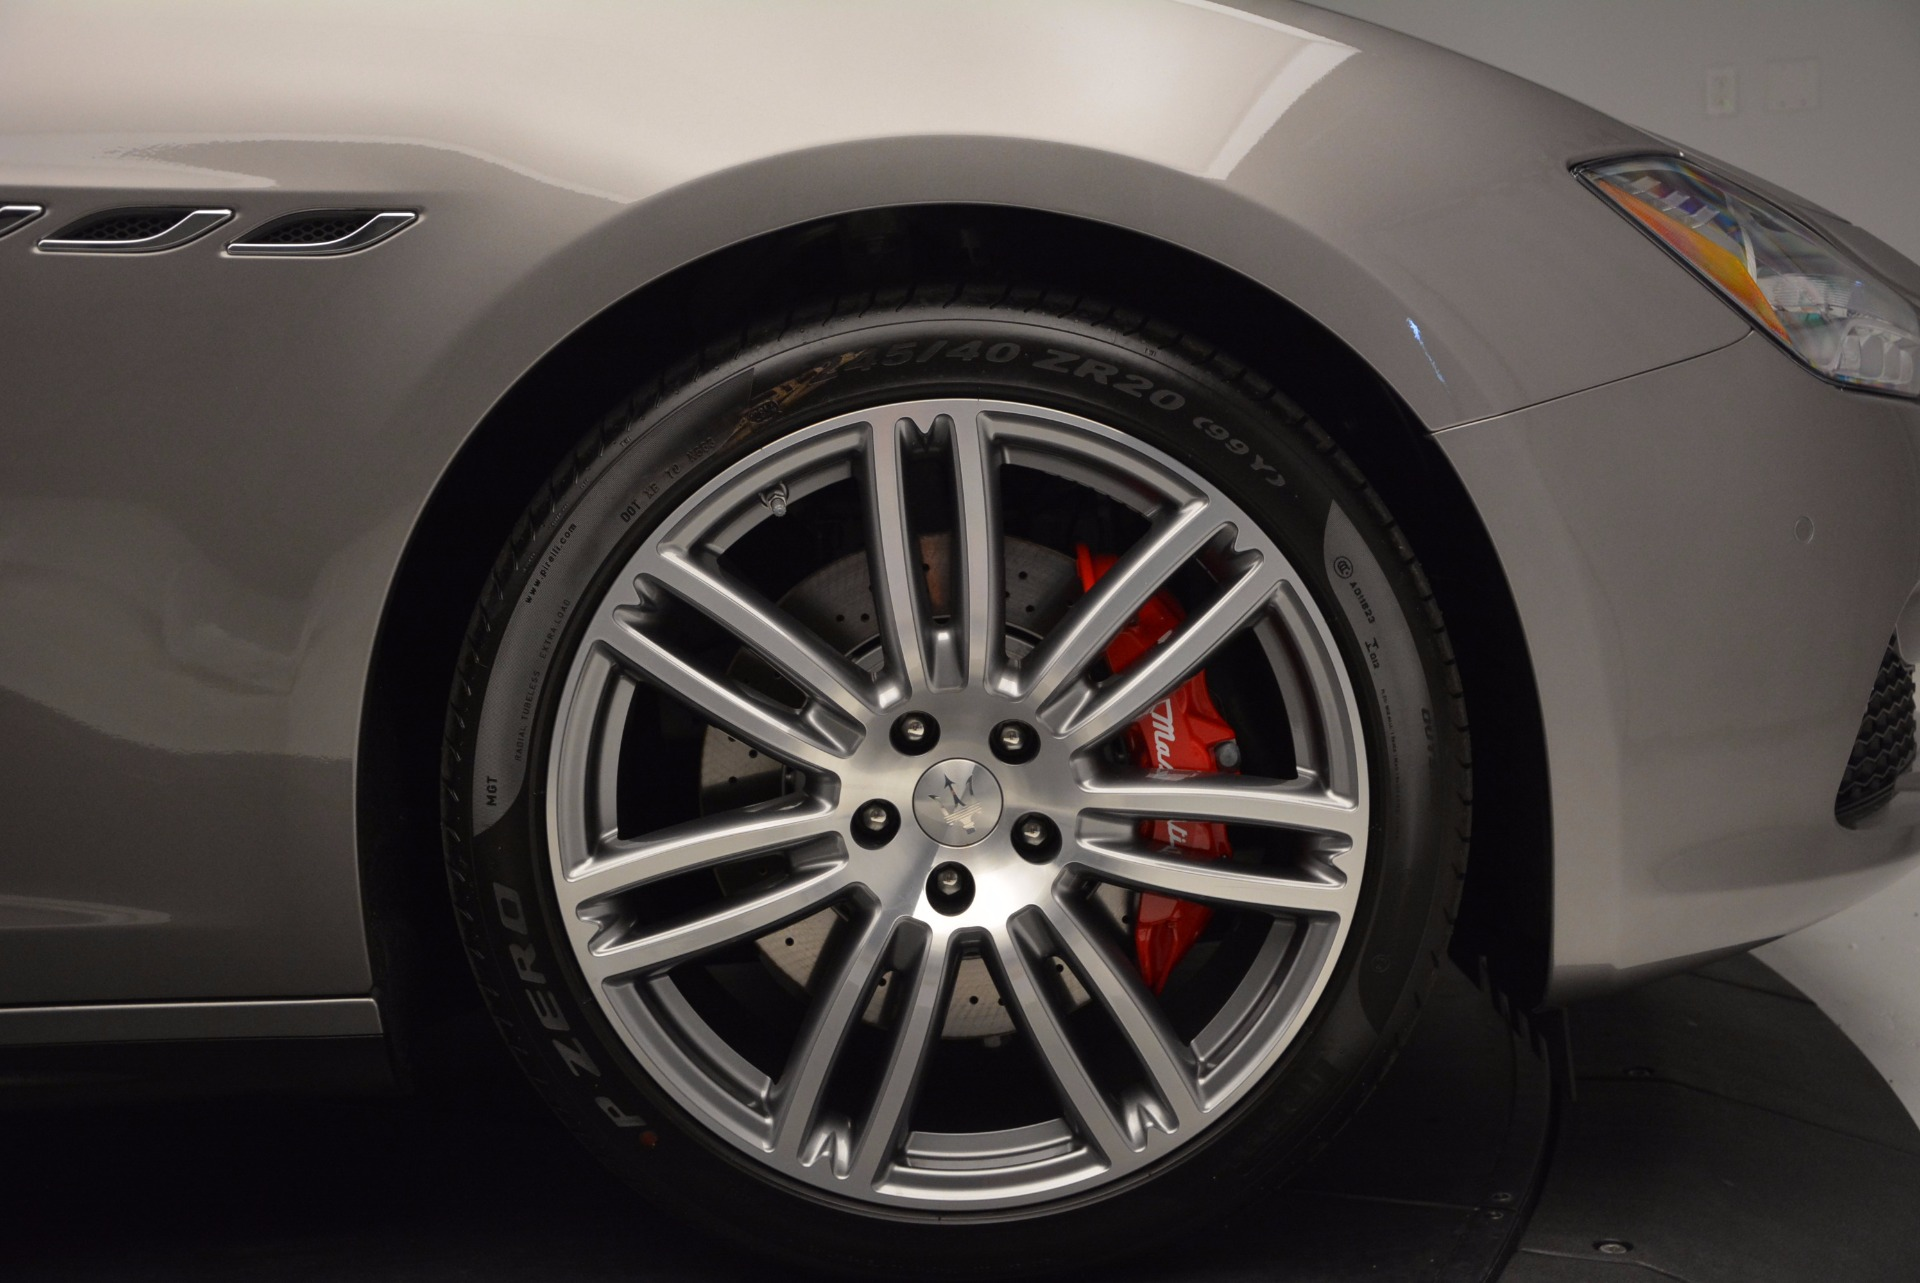 Used 2015 Maserati Ghibli S Q4 For Sale In Greenwich, CT 1290_p26